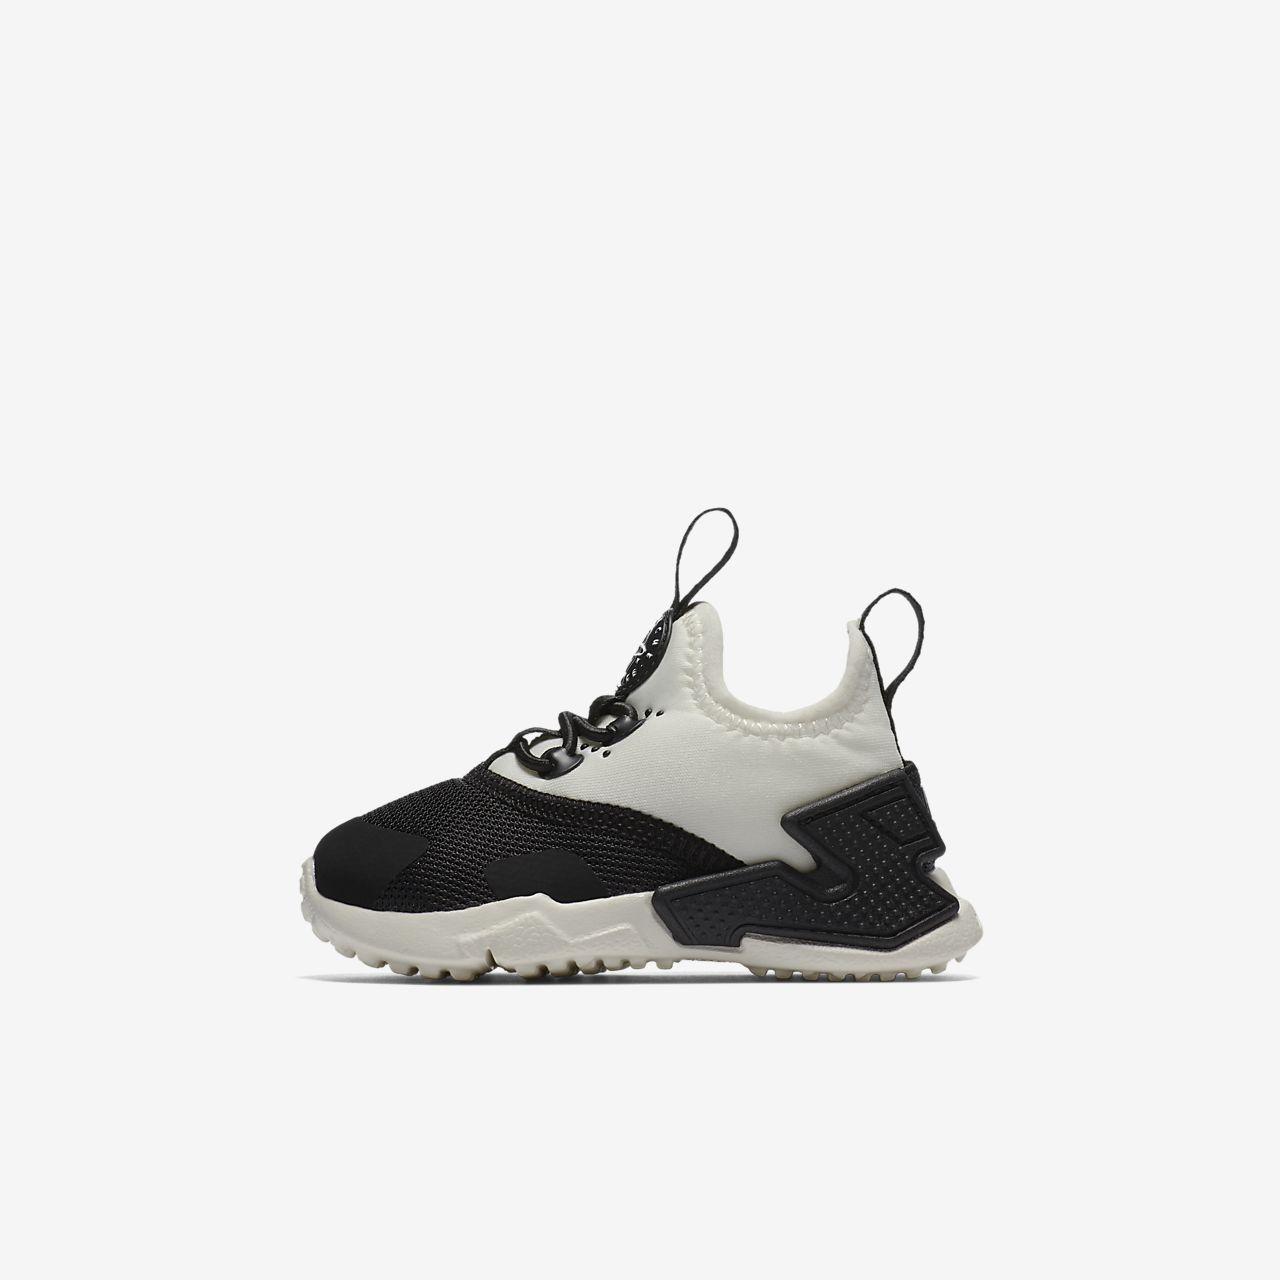 ... Nike Huarache Run Drift Infant/Toddler Shoe